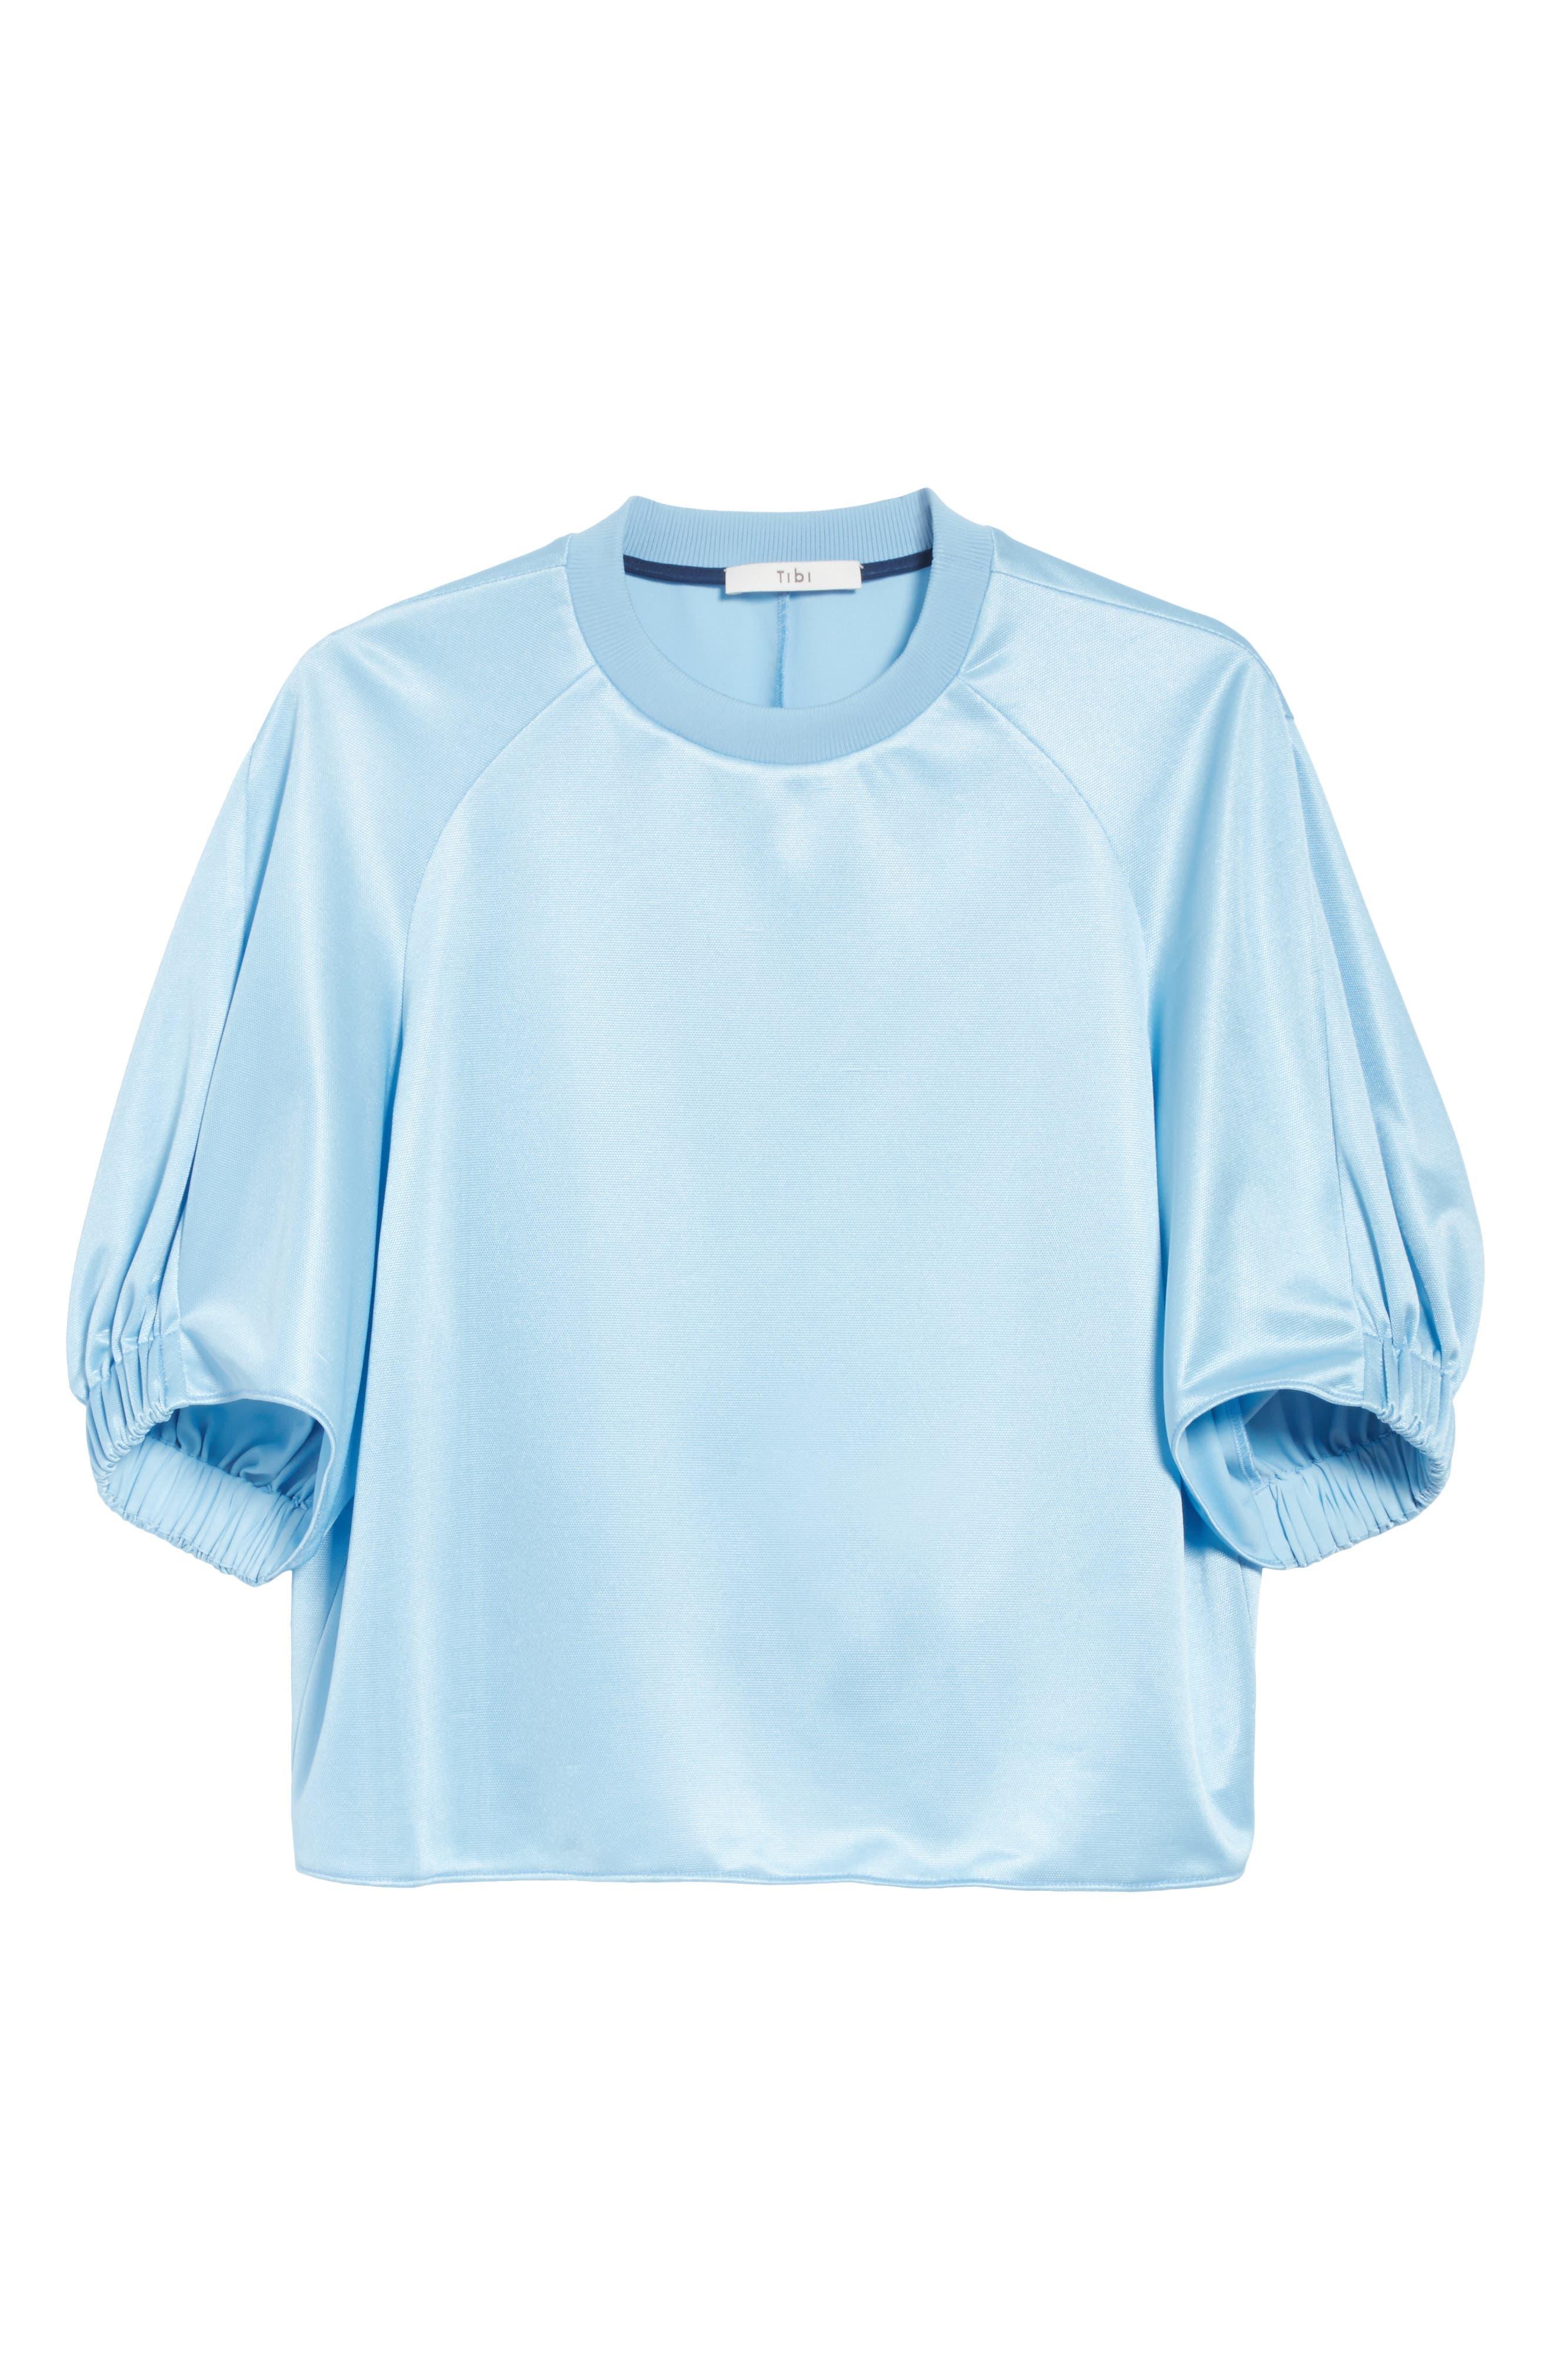 Dolman Sleeve Top,                             Alternate thumbnail 6, color,                             Oxford Blue